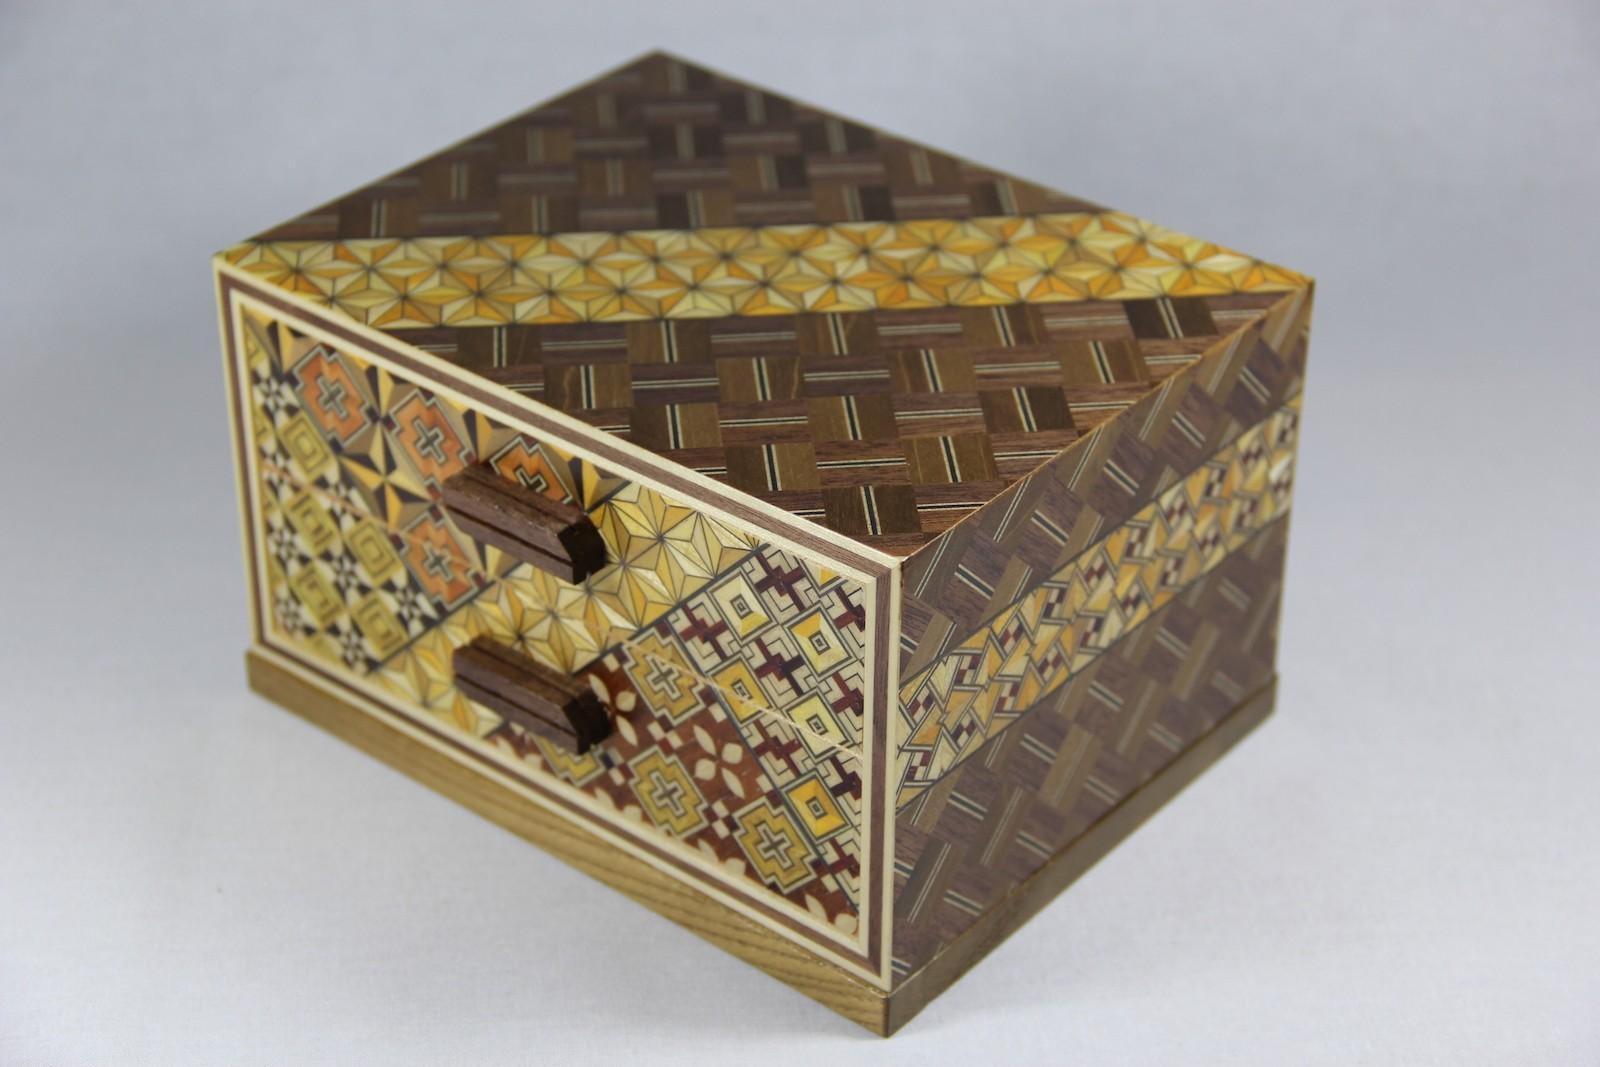 5 SUN 2 DRAWERS BOX KOYOSEGI